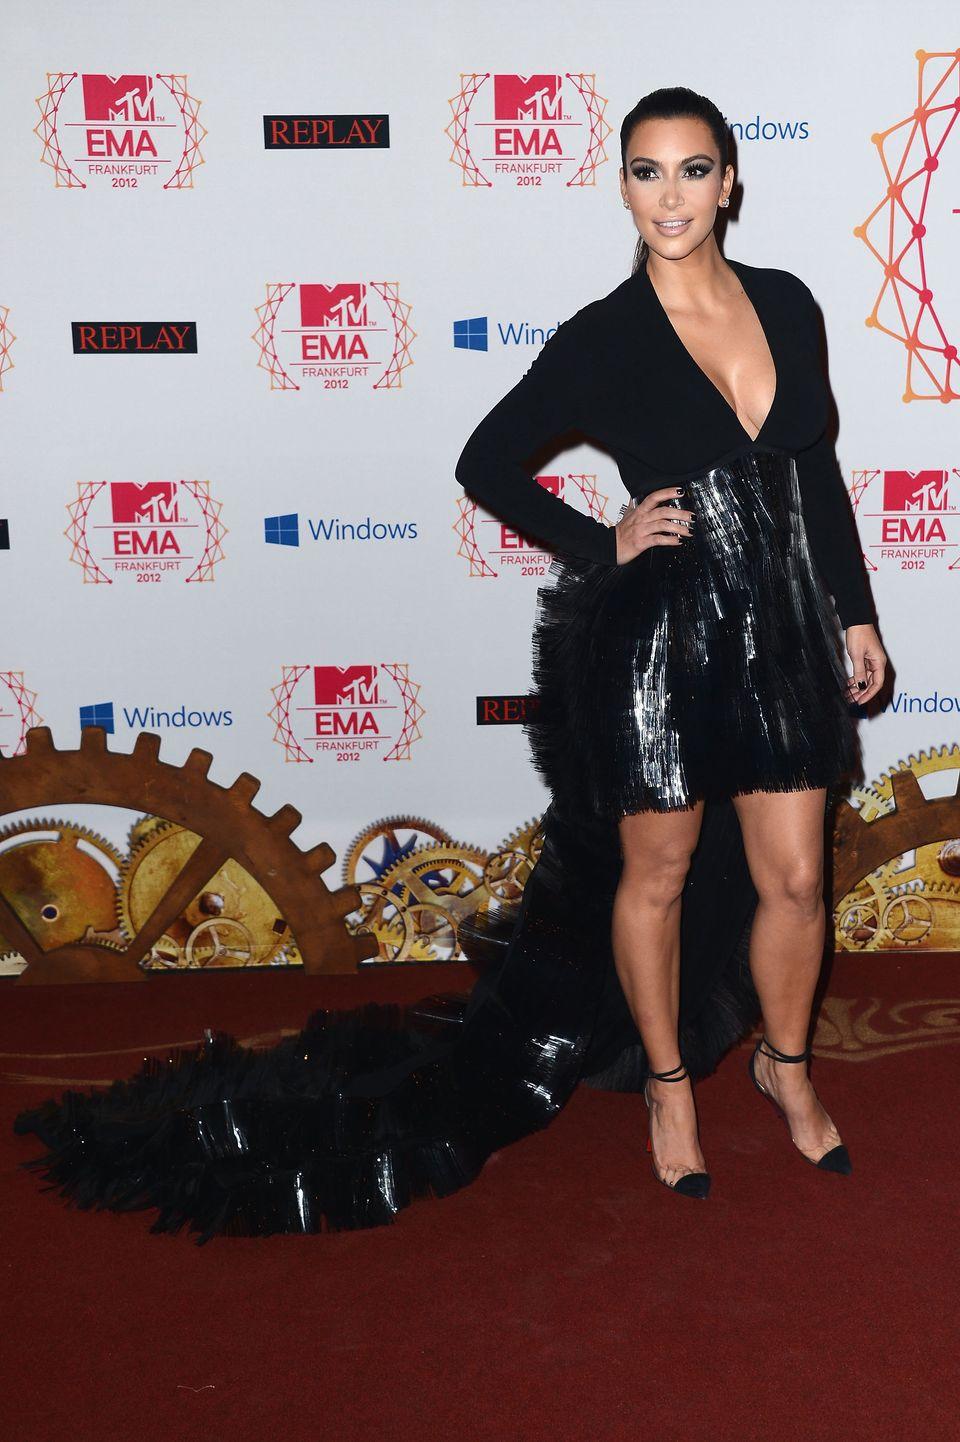 FRANKFURT AM MAIN, GERMANY - NOVEMBER 11:  Kim Kardashian attends the MTV EMA's 2012 at Festhalle Frankfurt on November 11, 2